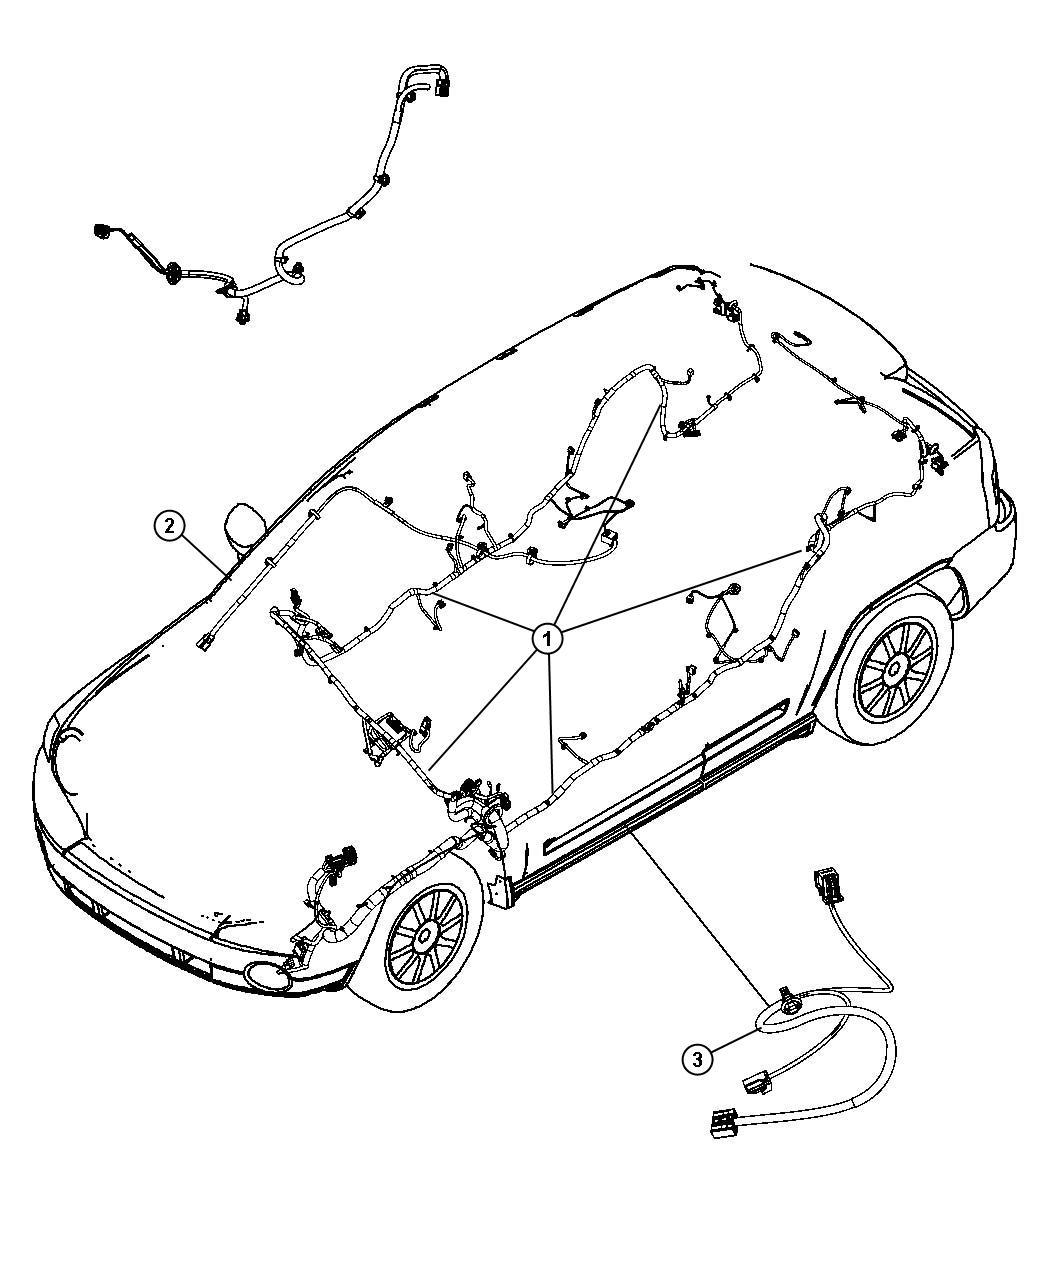 WIRING Wiring Harness Diagram 2010 Dodge Caliber Sxt Doge FULL Version HD  Quality Sxt Doge - OKCWEBDESIGNER.KINGGO.FR okcwebdesigner kinggo fr